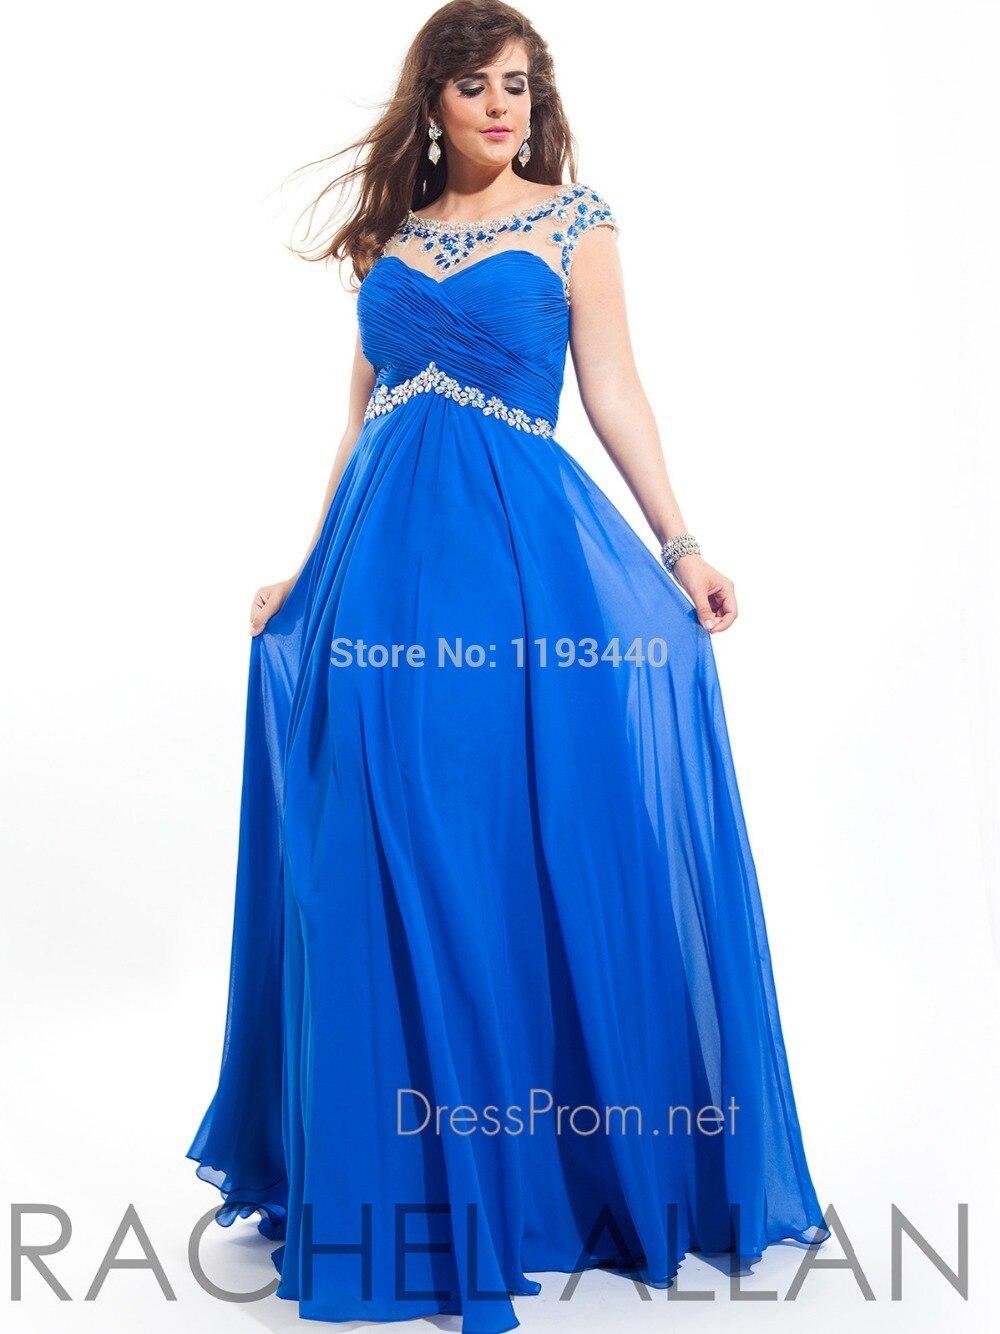 Elegant Beaded Scoop Empire Waist Plus Size Prom Dresses 2015 New ...